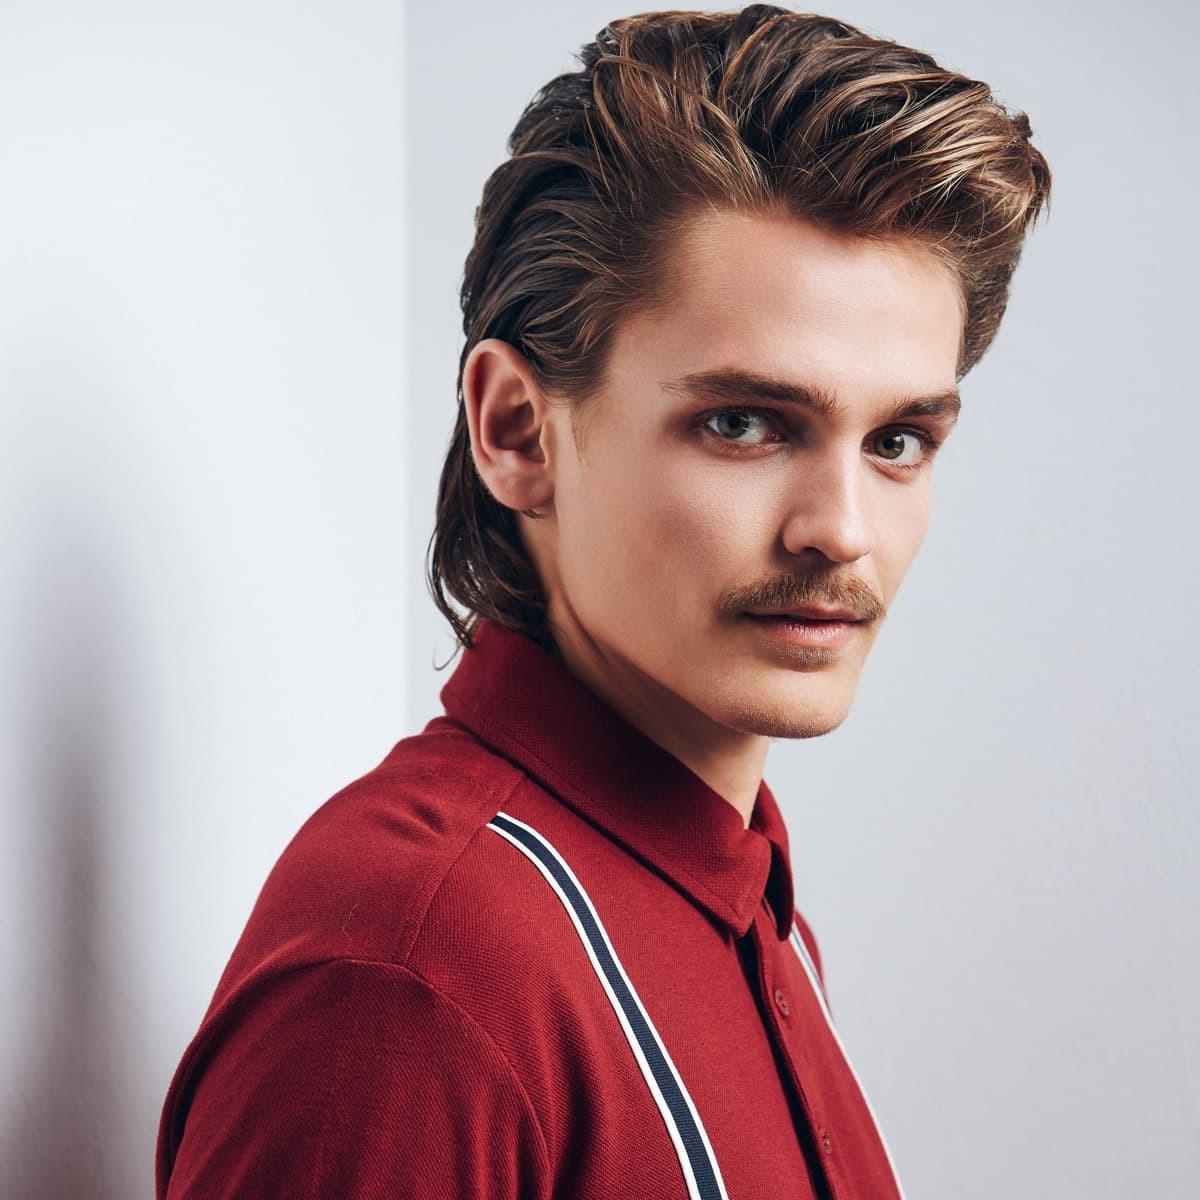 Frisuren Langhaar 2019  Frisuren 2019 Frühjahr Sommer 2019 Frisuren Trends aus